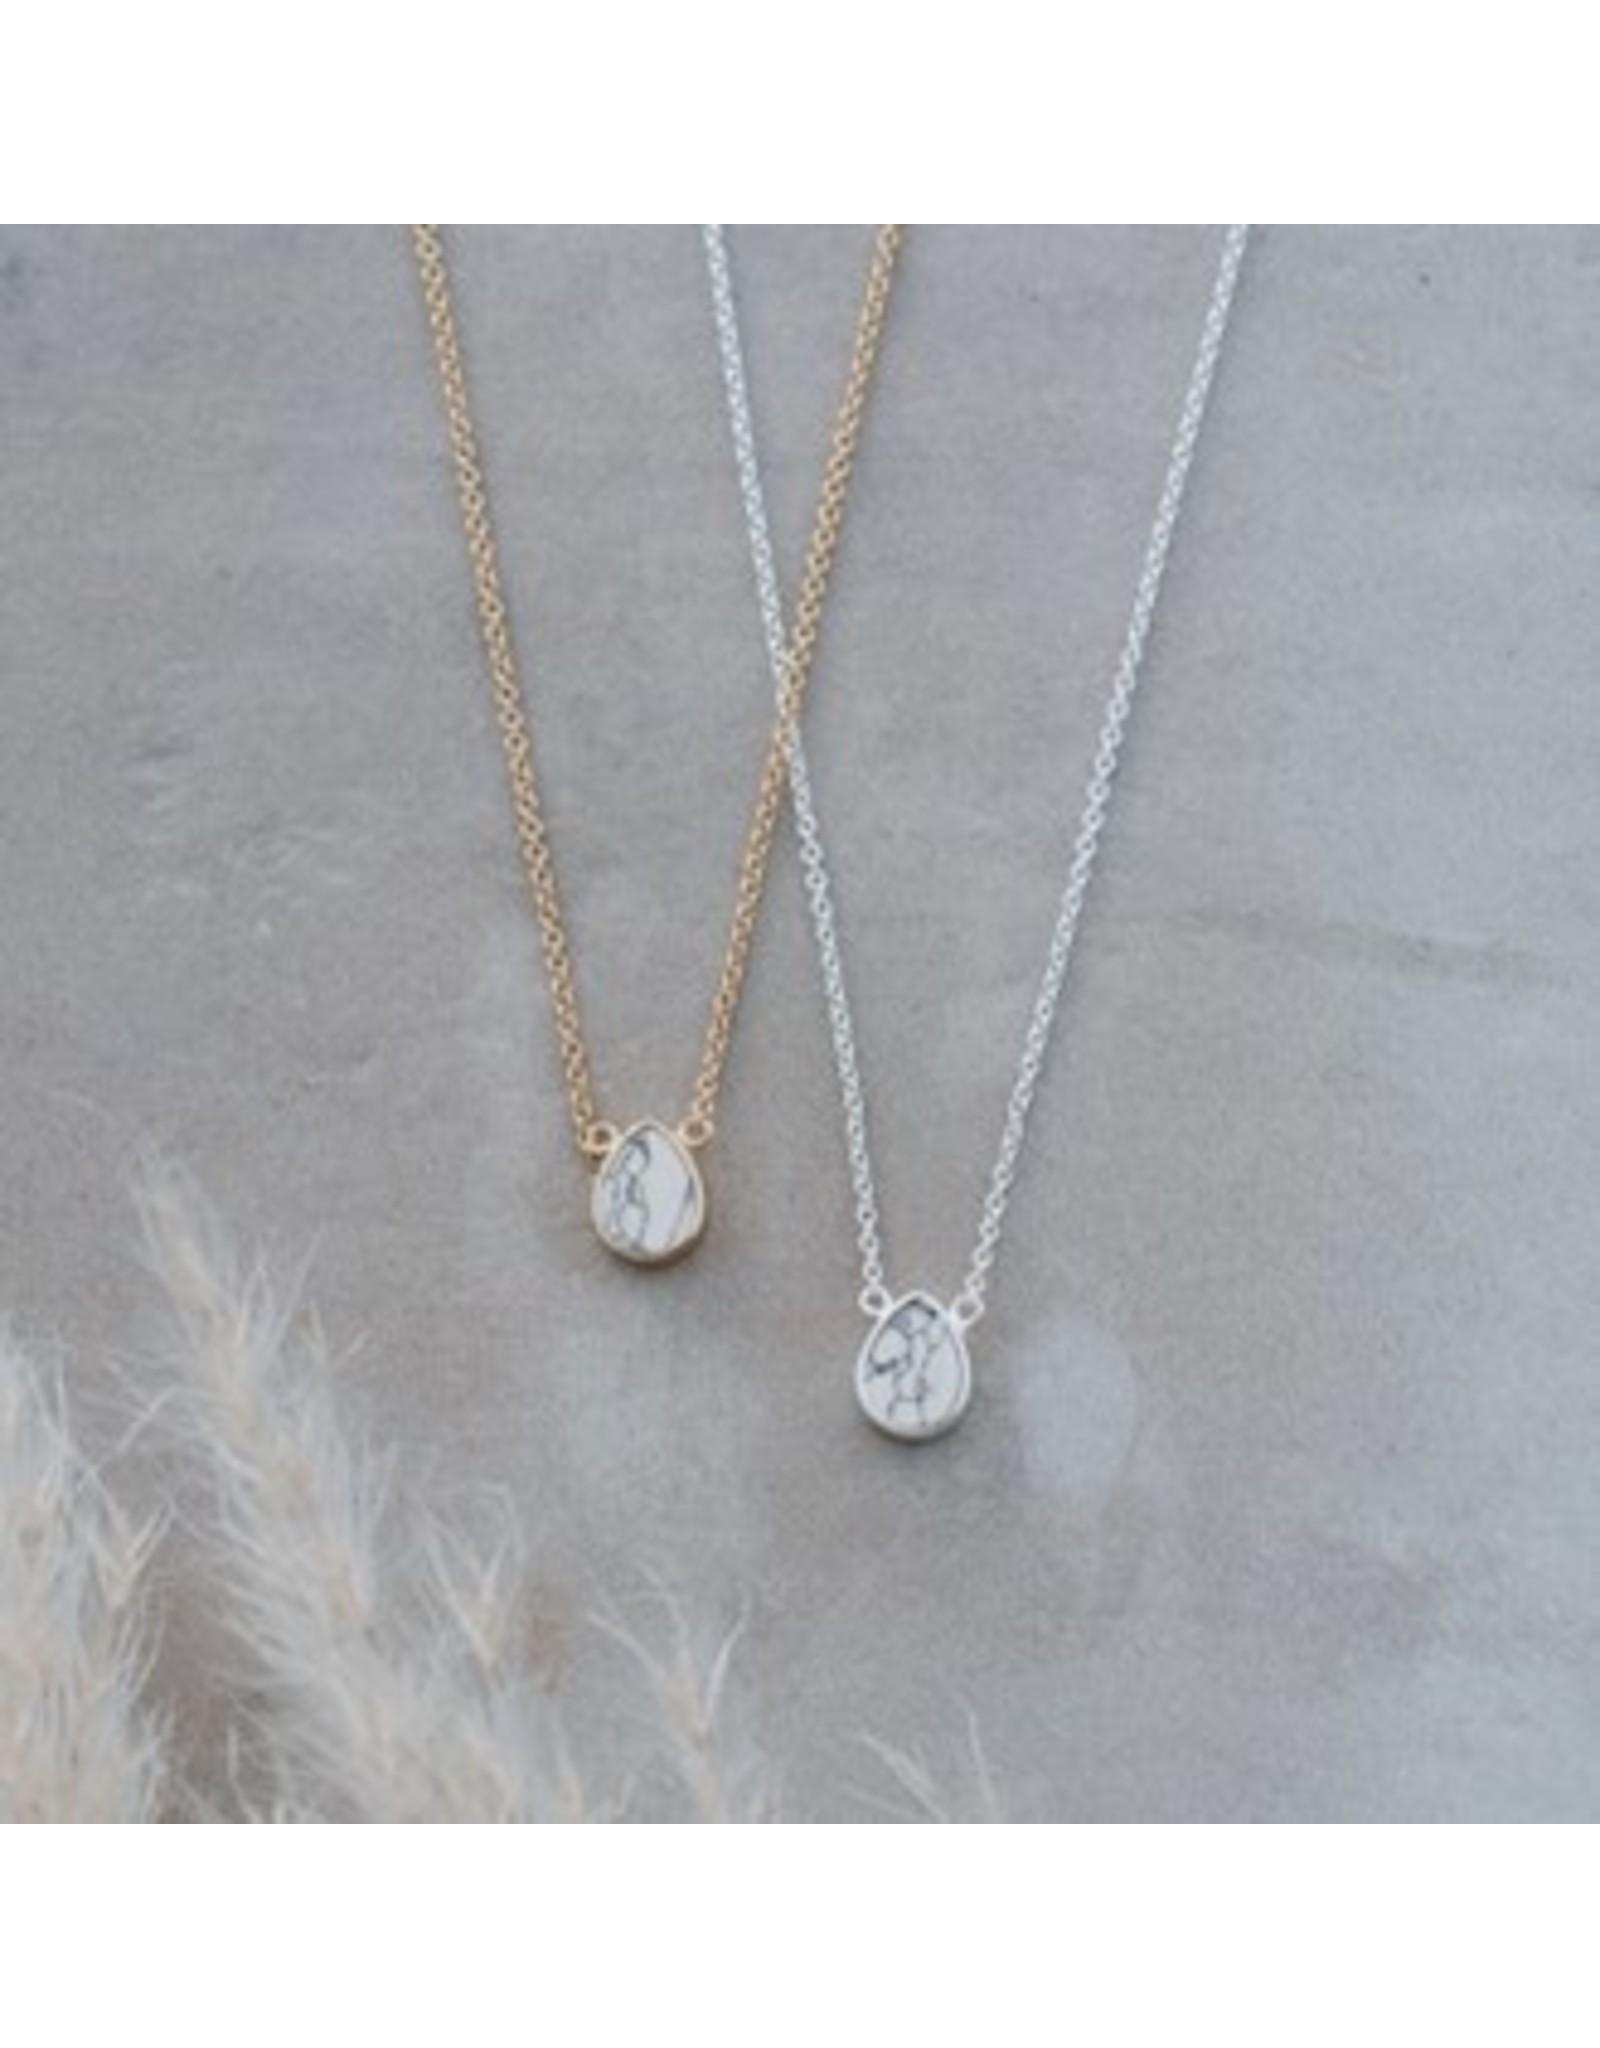 Glee jewelry Apex Necklace, Howlite/Sliver